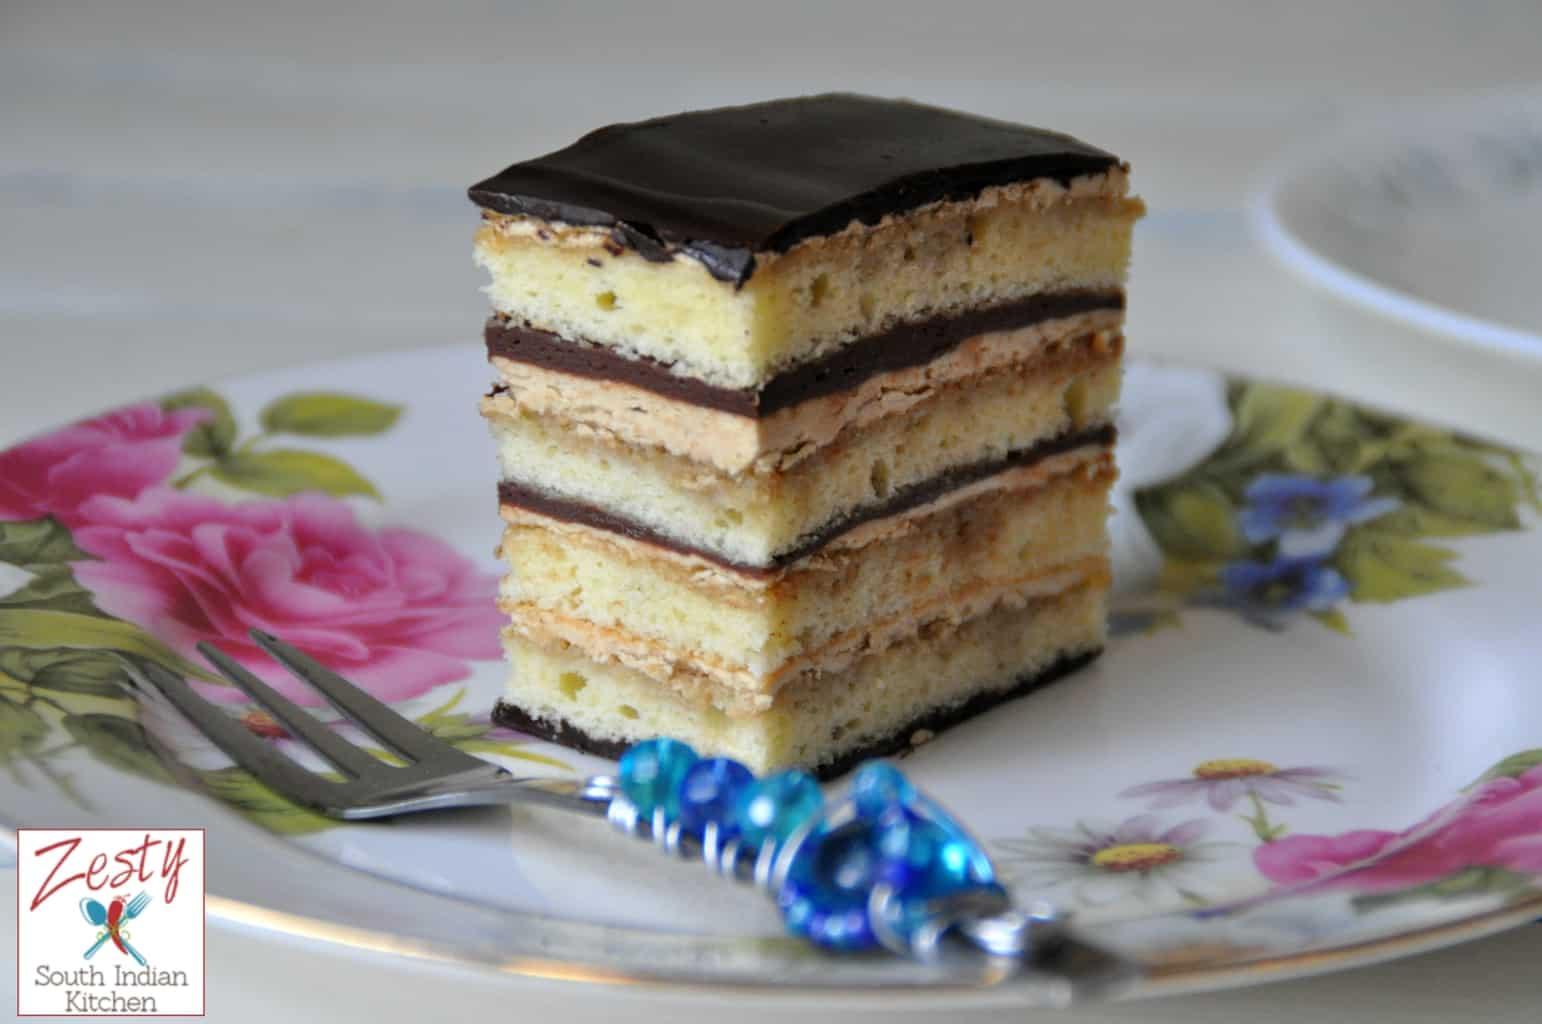 How Do You Make Chocolate Coffee Cake